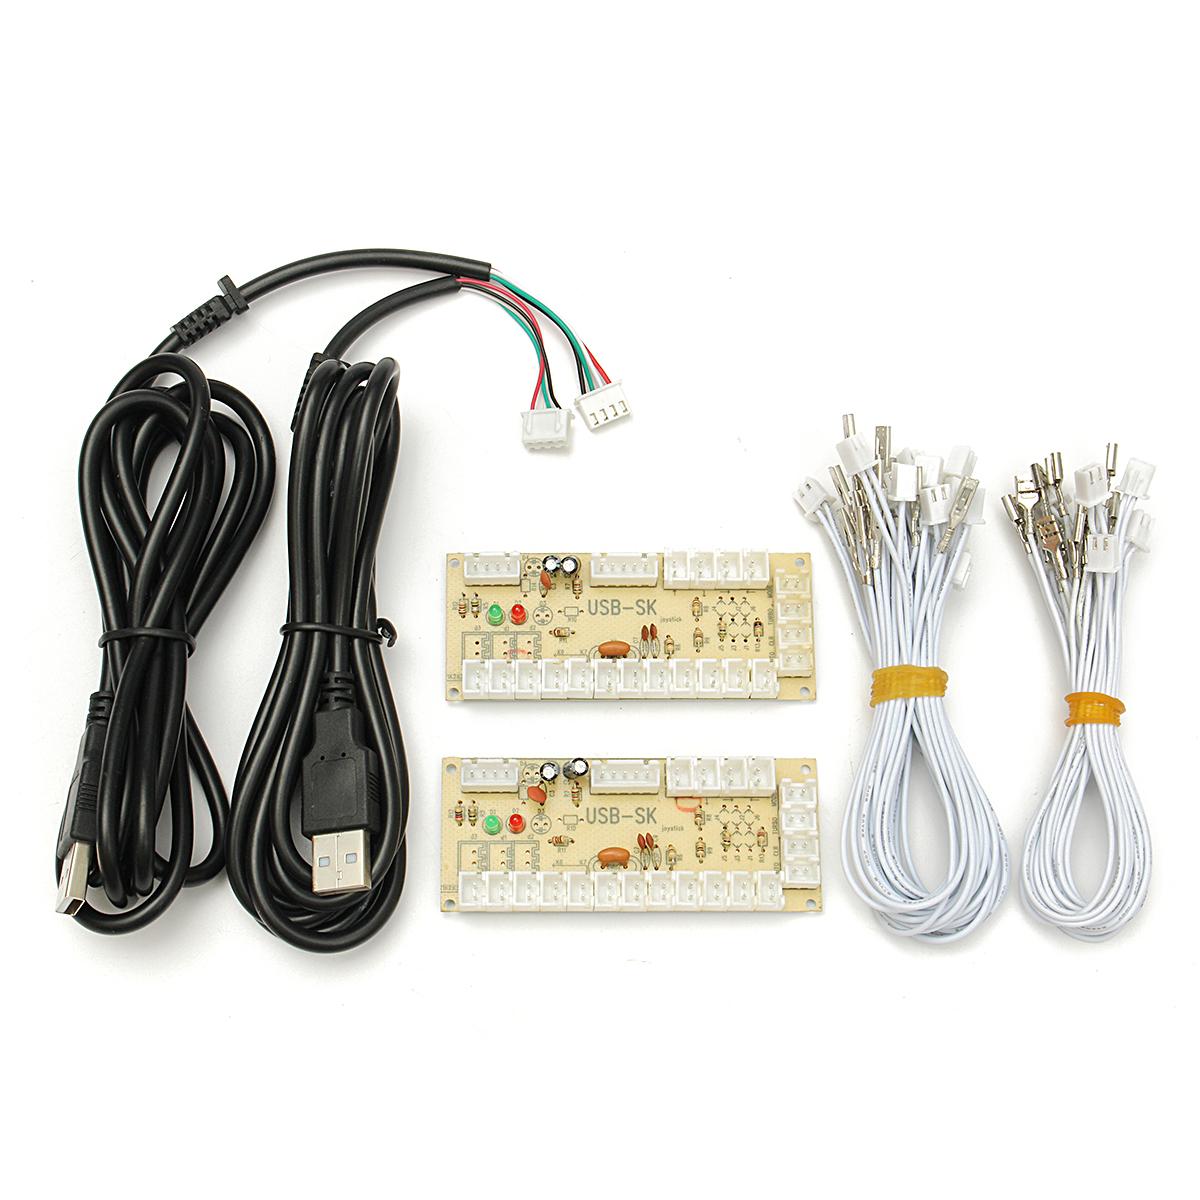 Arcade Encoder PC To 2pin Joystick + Happ Button 4 8mm Wires Zero Delay USB